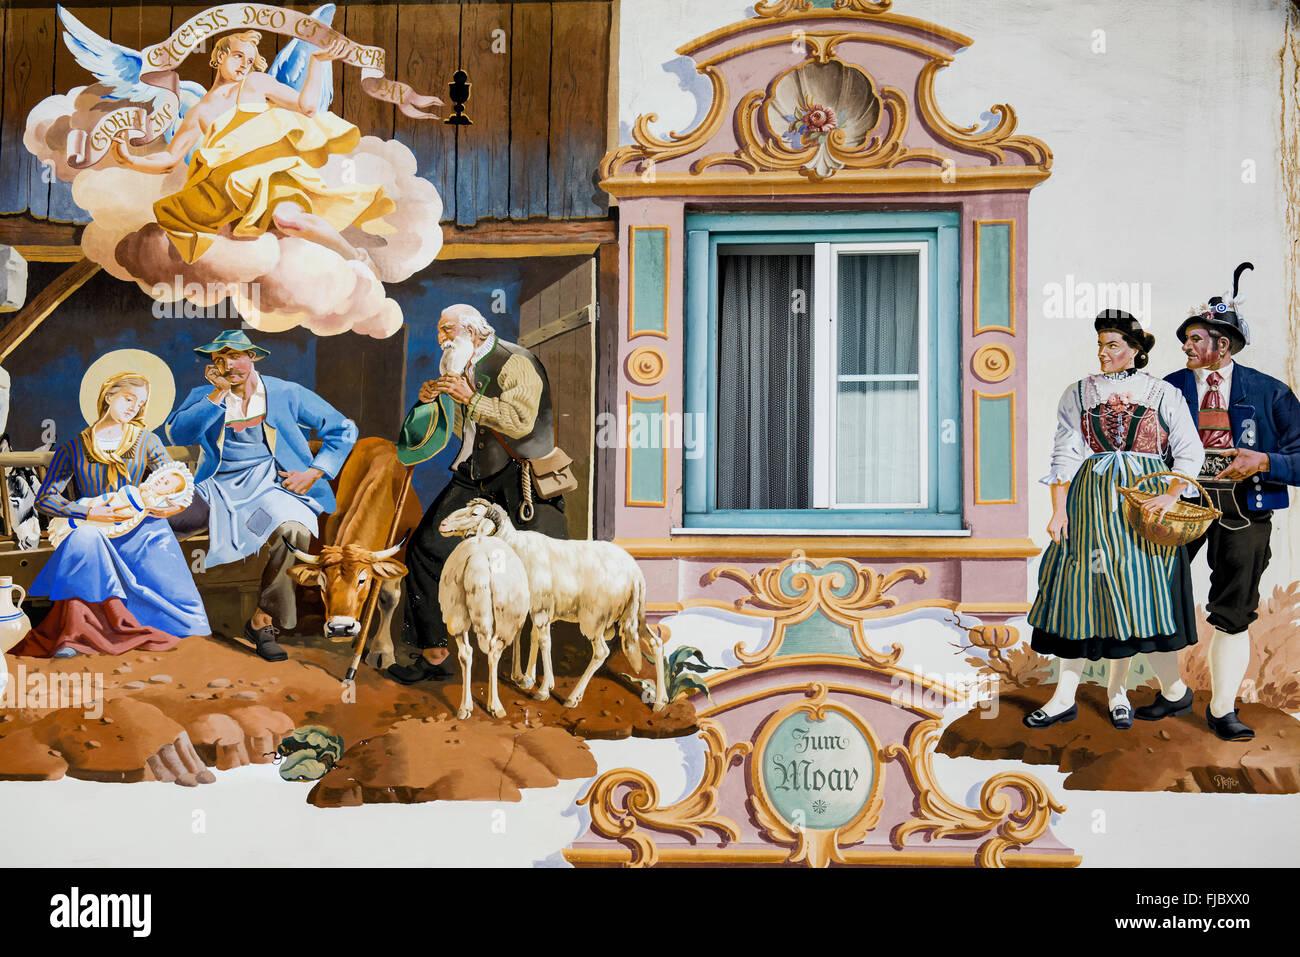 Lüftlmalerei fresco painting adorning the facade of a house, detail, Garmisch-Partenkirchen, Upper Bavaria, - Stock Image